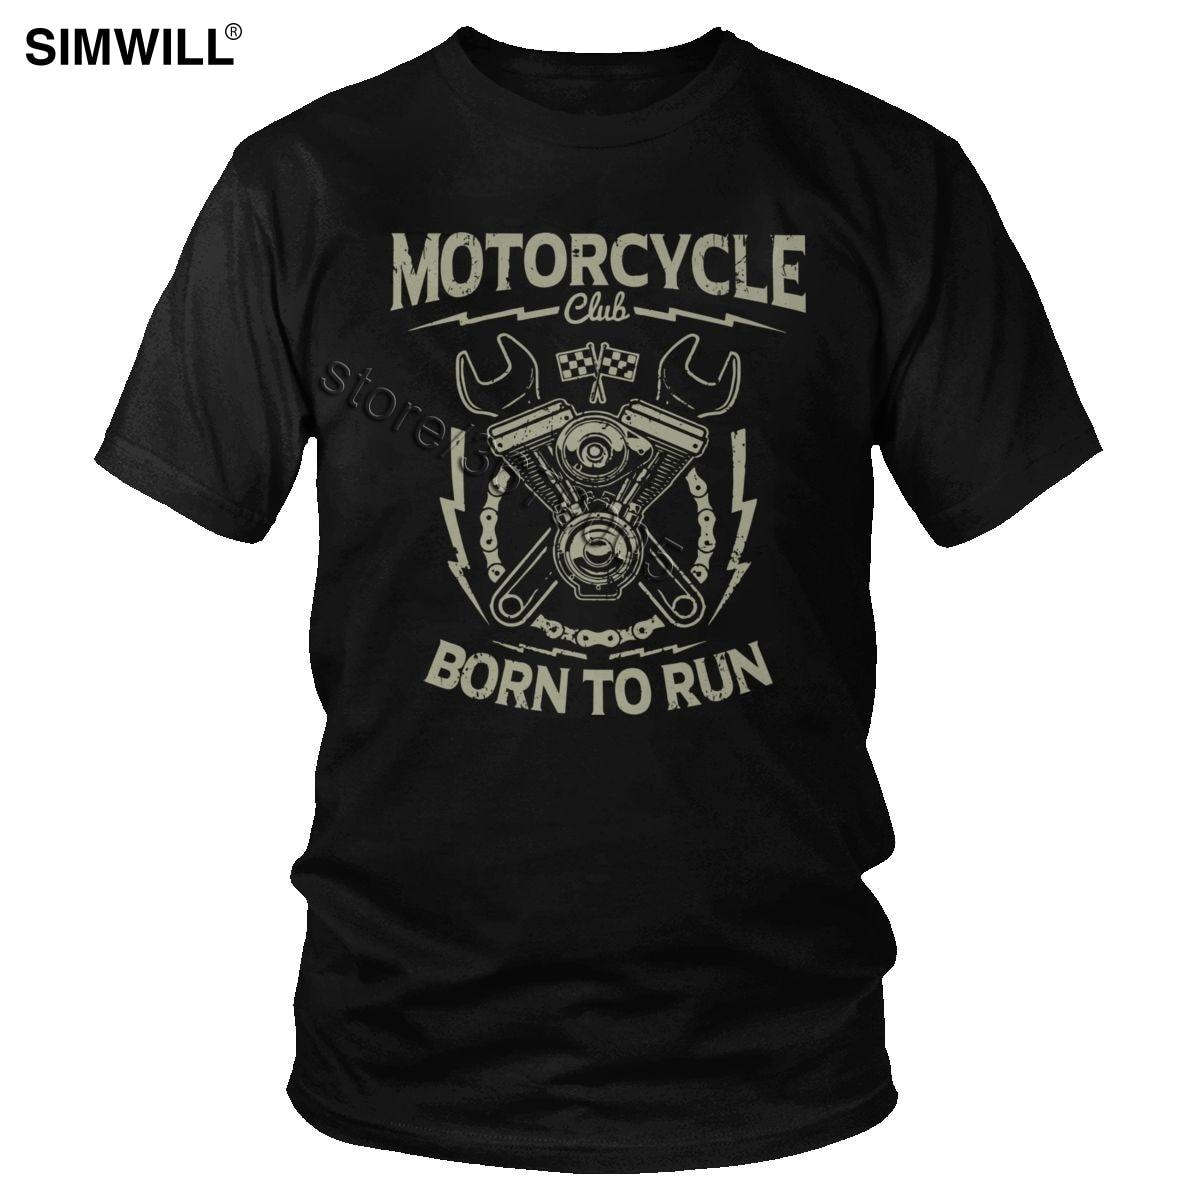 Trendy Retro T-Shirt Men Cotton Custom Motorcycle Repair Service T Shirt Short Sleeve Born To Run Tee Rider Club Graphic Apparel